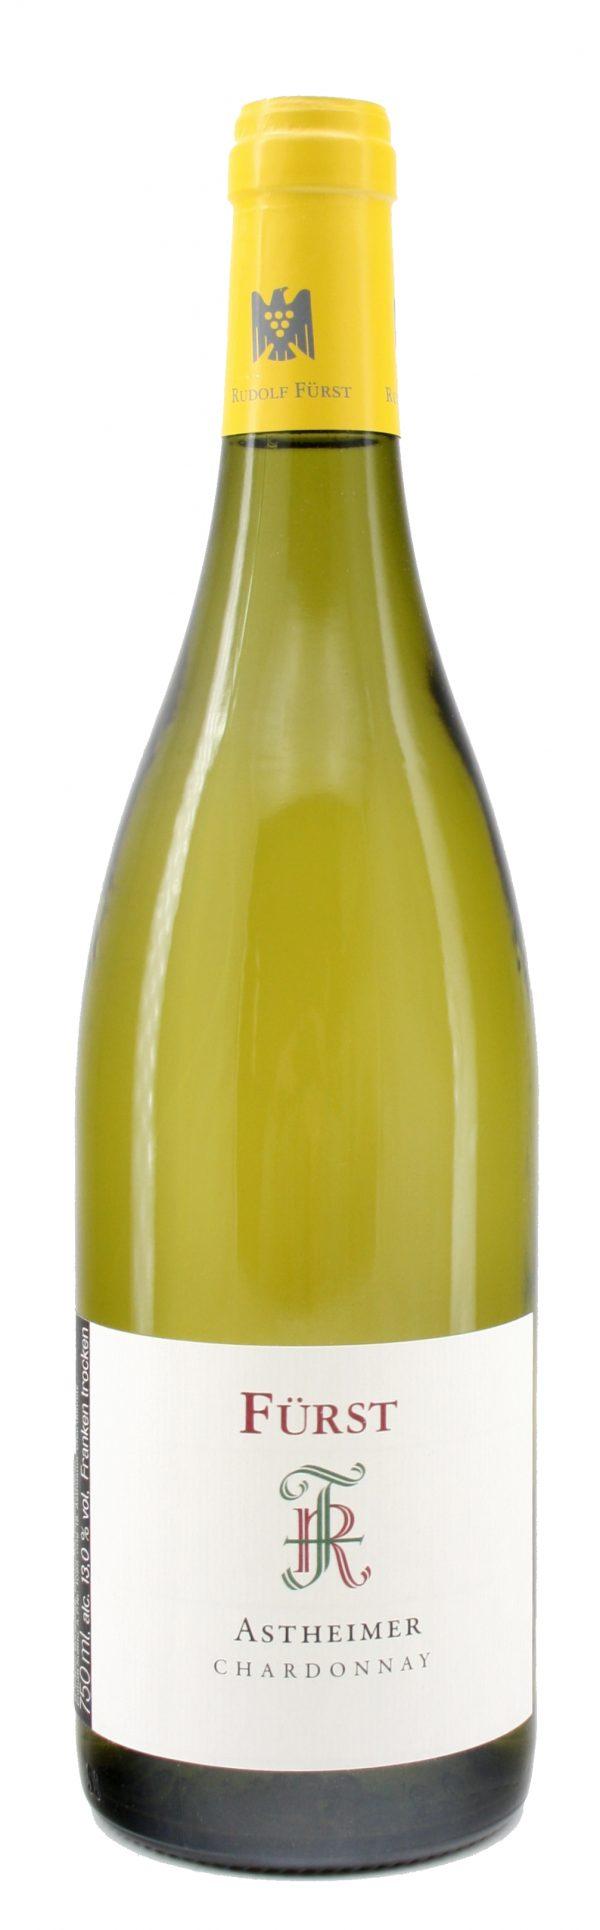 Astheimer Chardonnay 2017